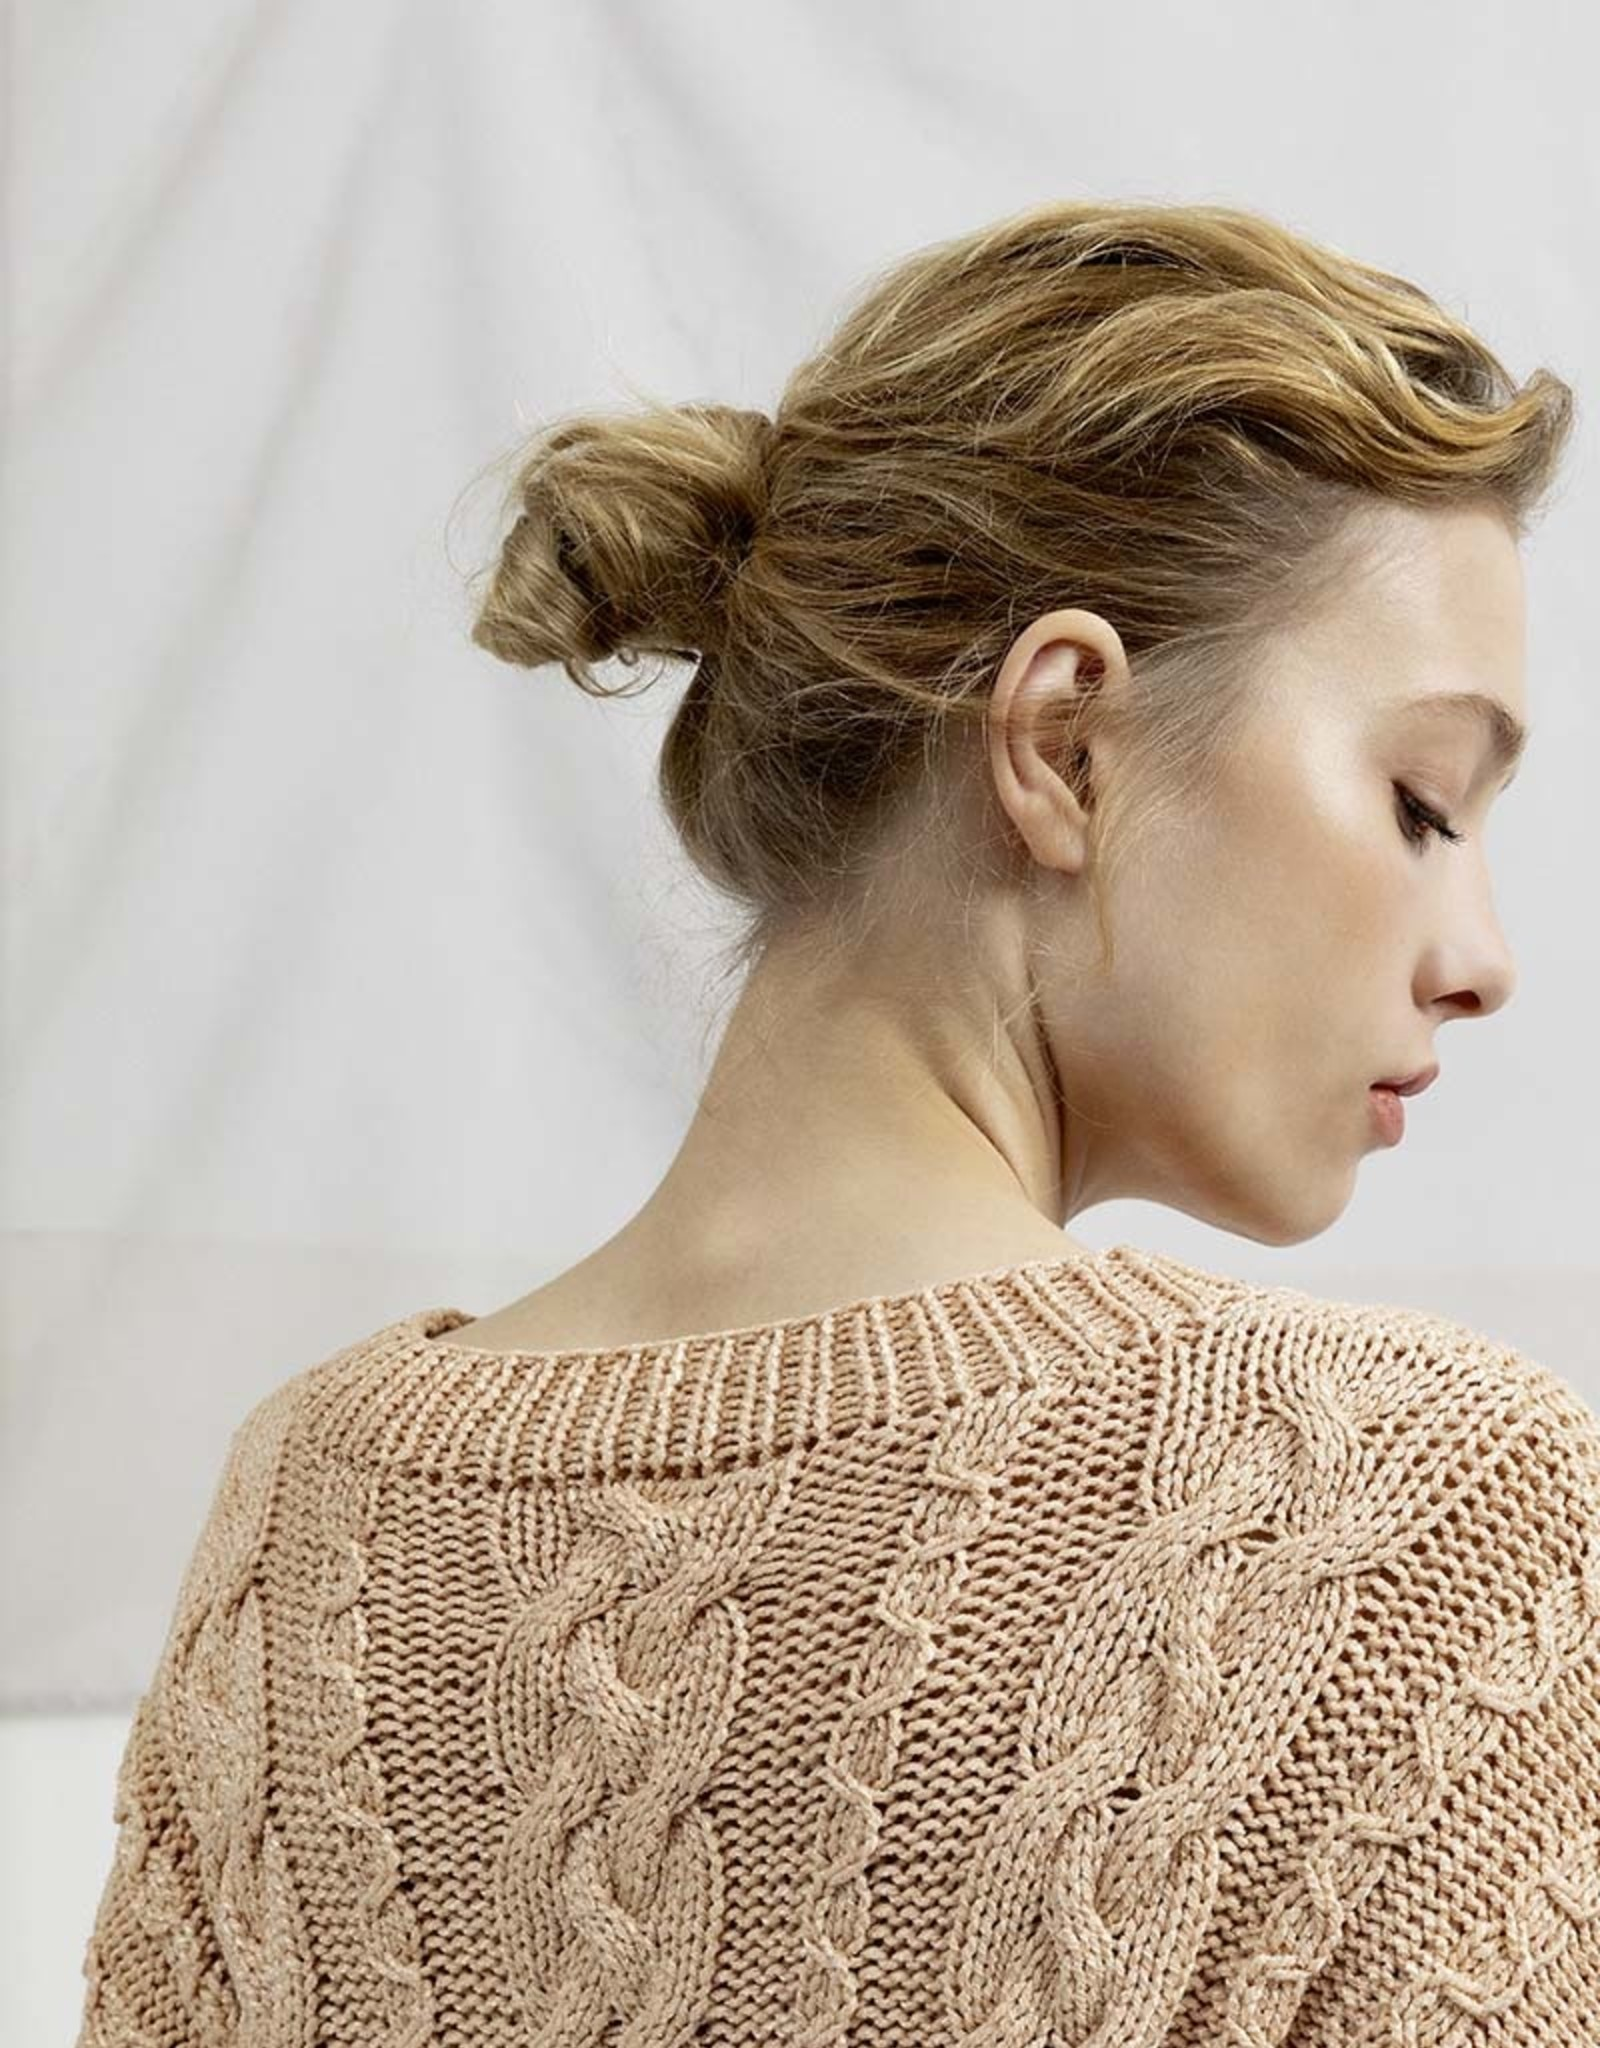 Angels-Knit by FDF Breipatroon zomertrui Janet 027 / M